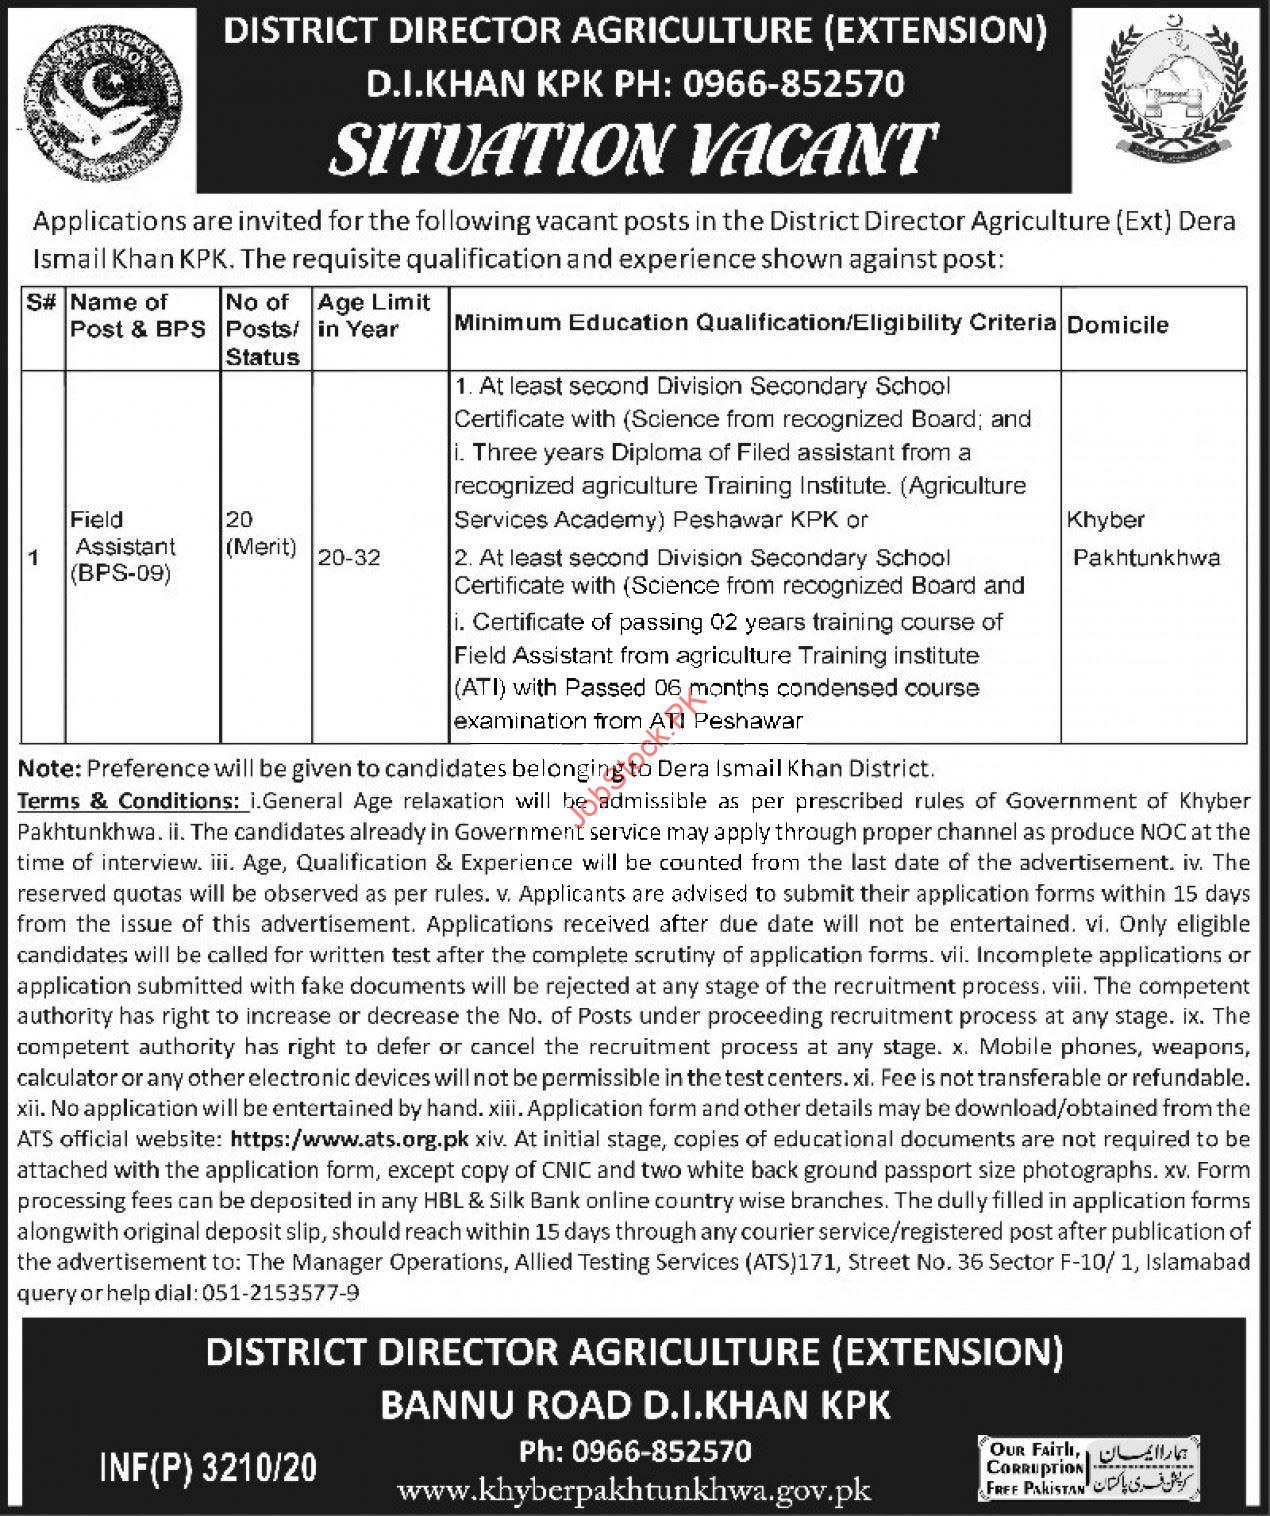 District Director Agriculture Extension Kpk D.i Khan 2020